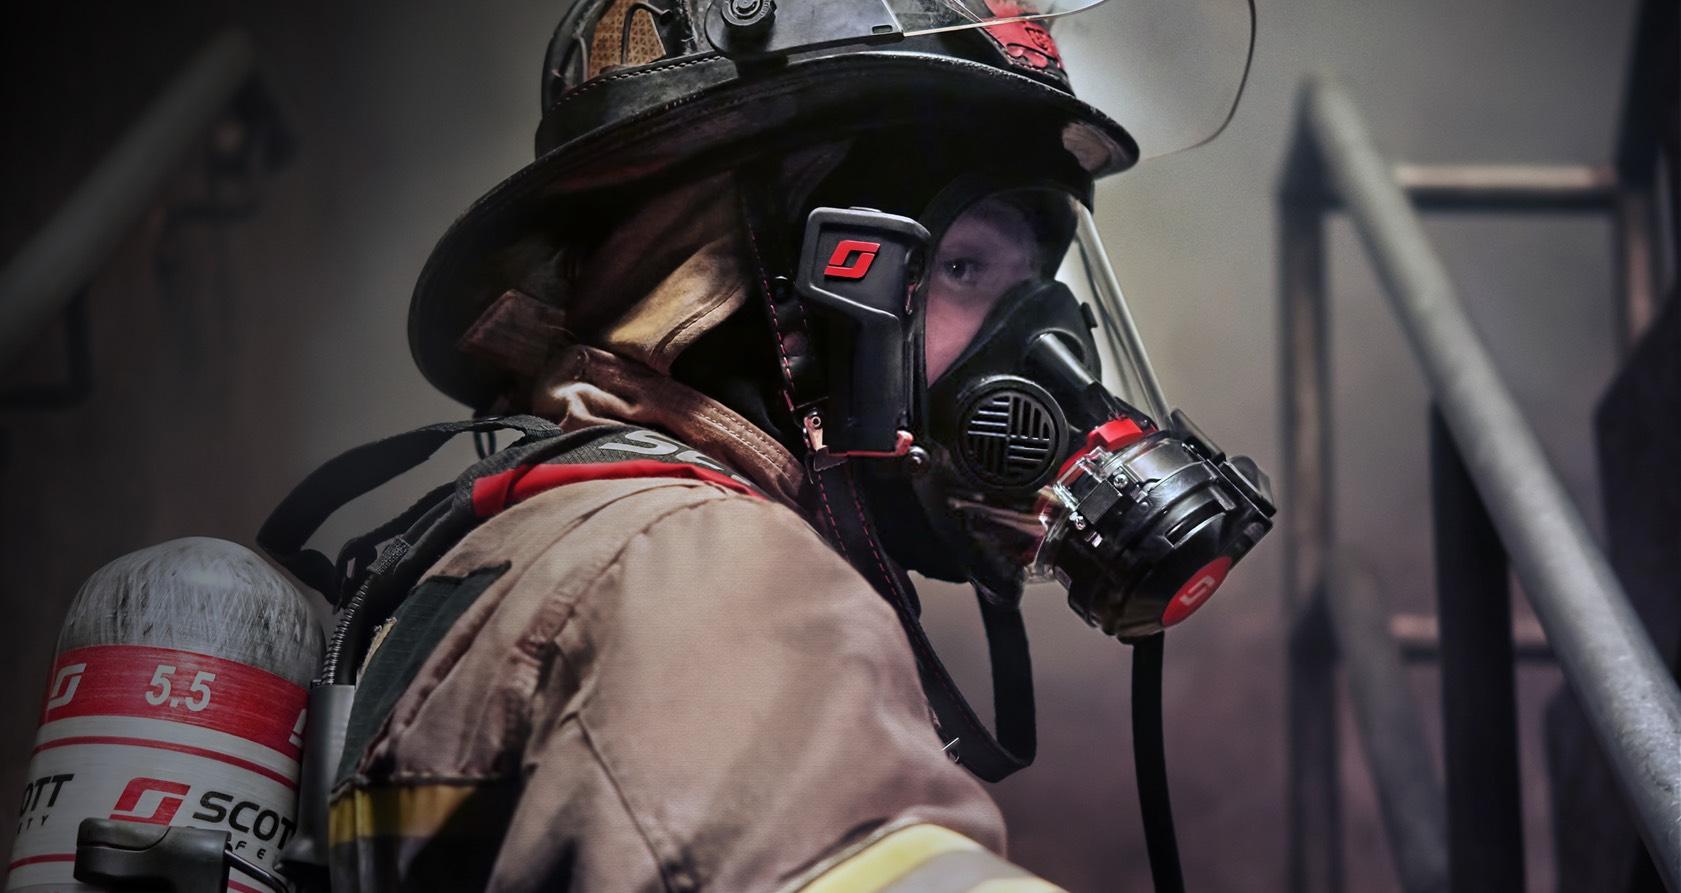 Feuerwehrschutzbekleidung